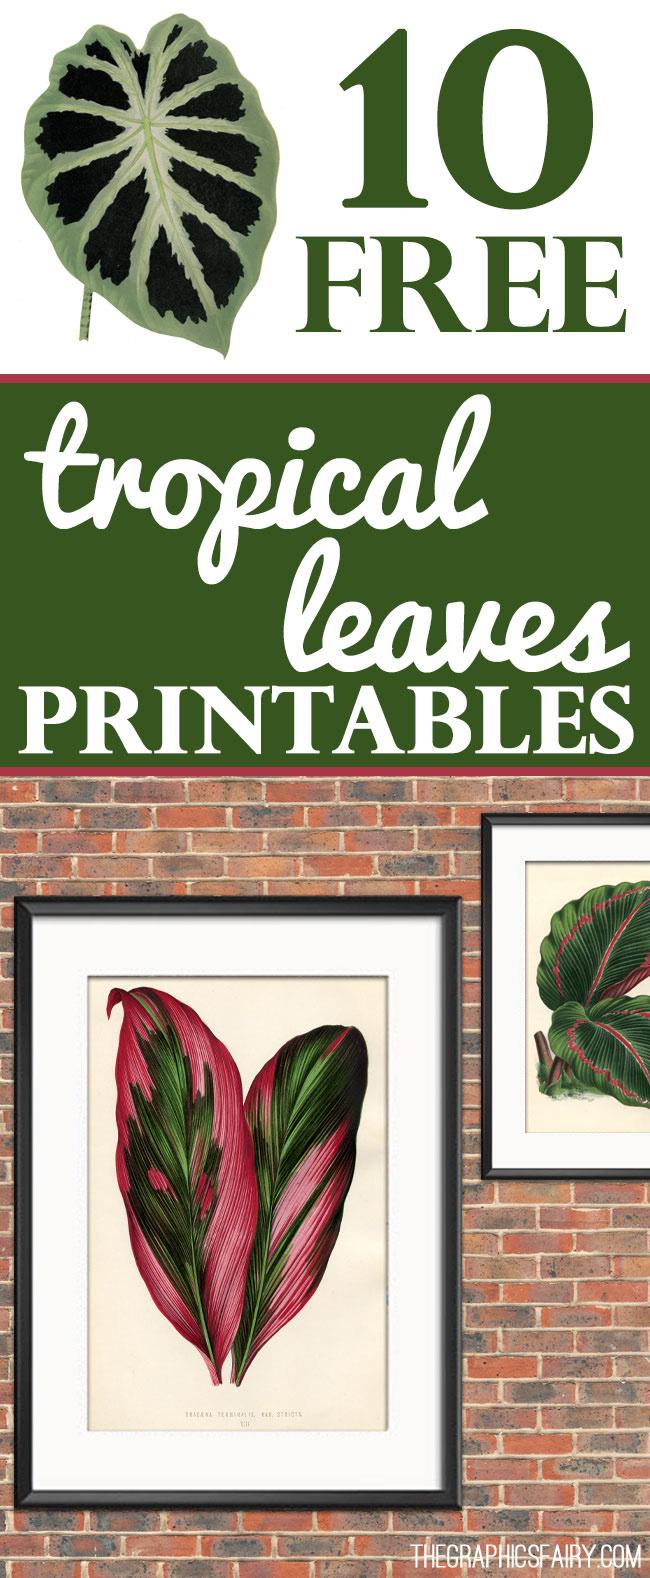 10 Free Tropical Leaves Printables